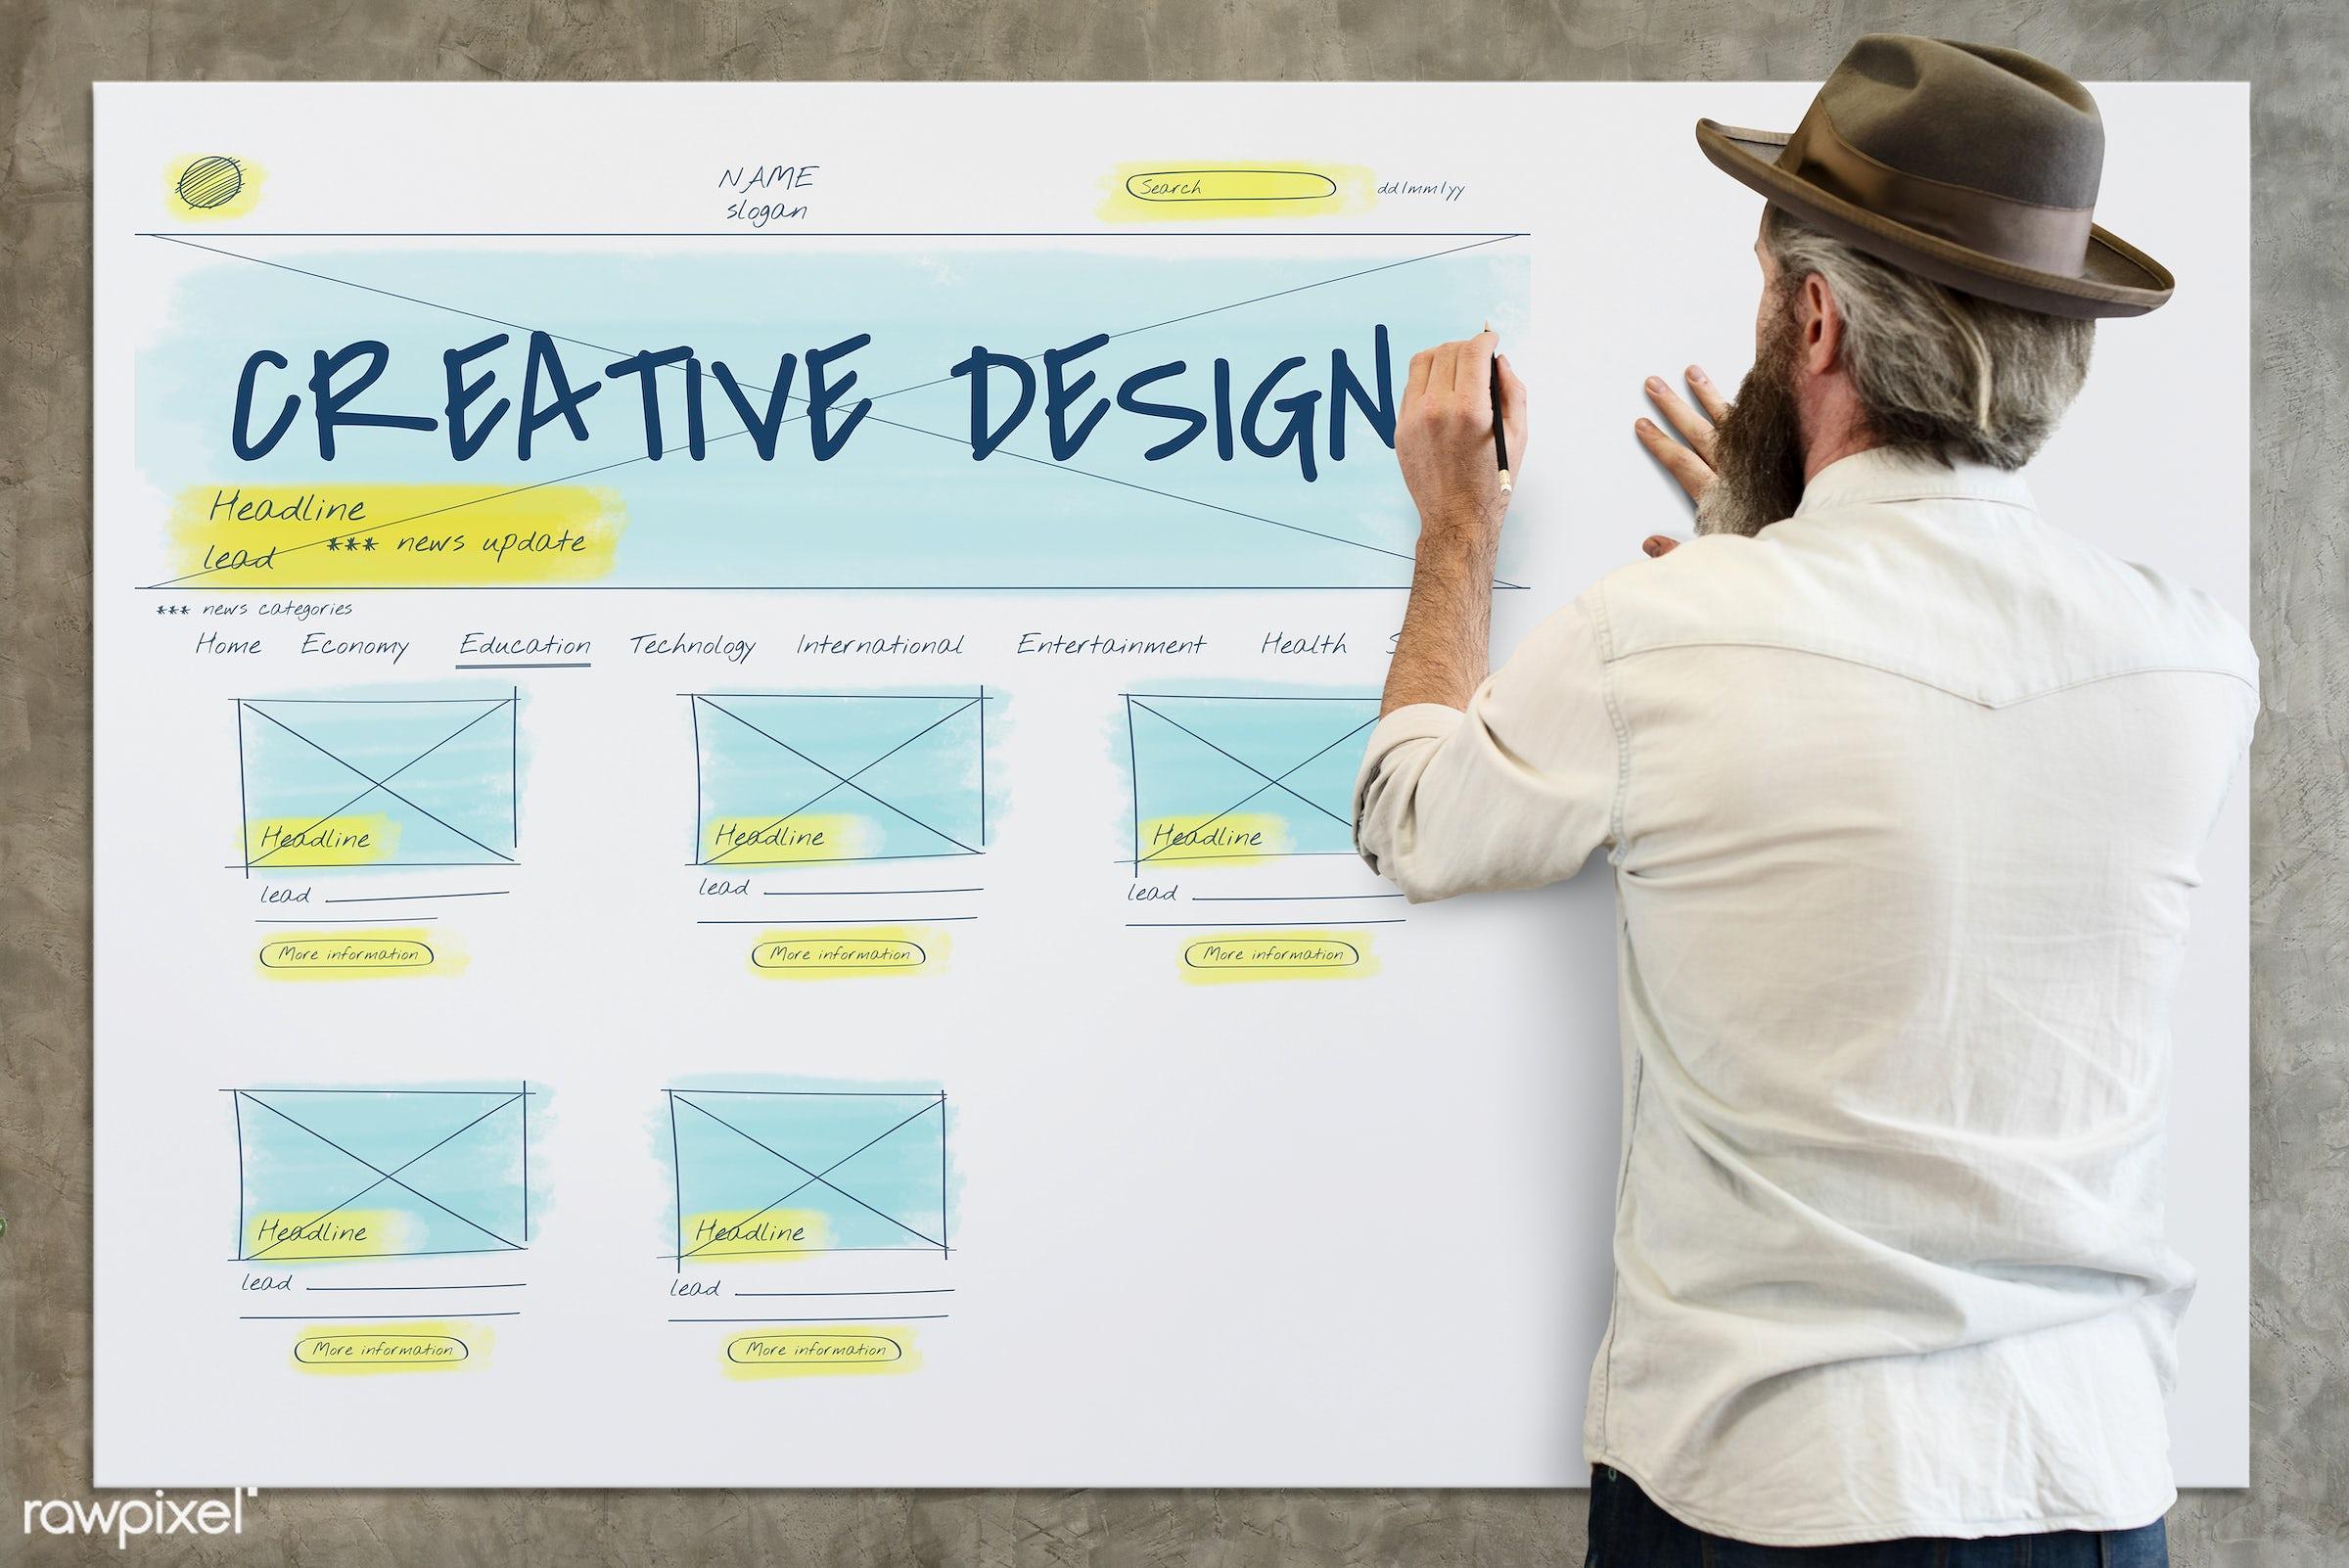 adult, alone, back, be creative, beard, beard guy, board, carefree, casual, chill, configuration, content, create, creative...